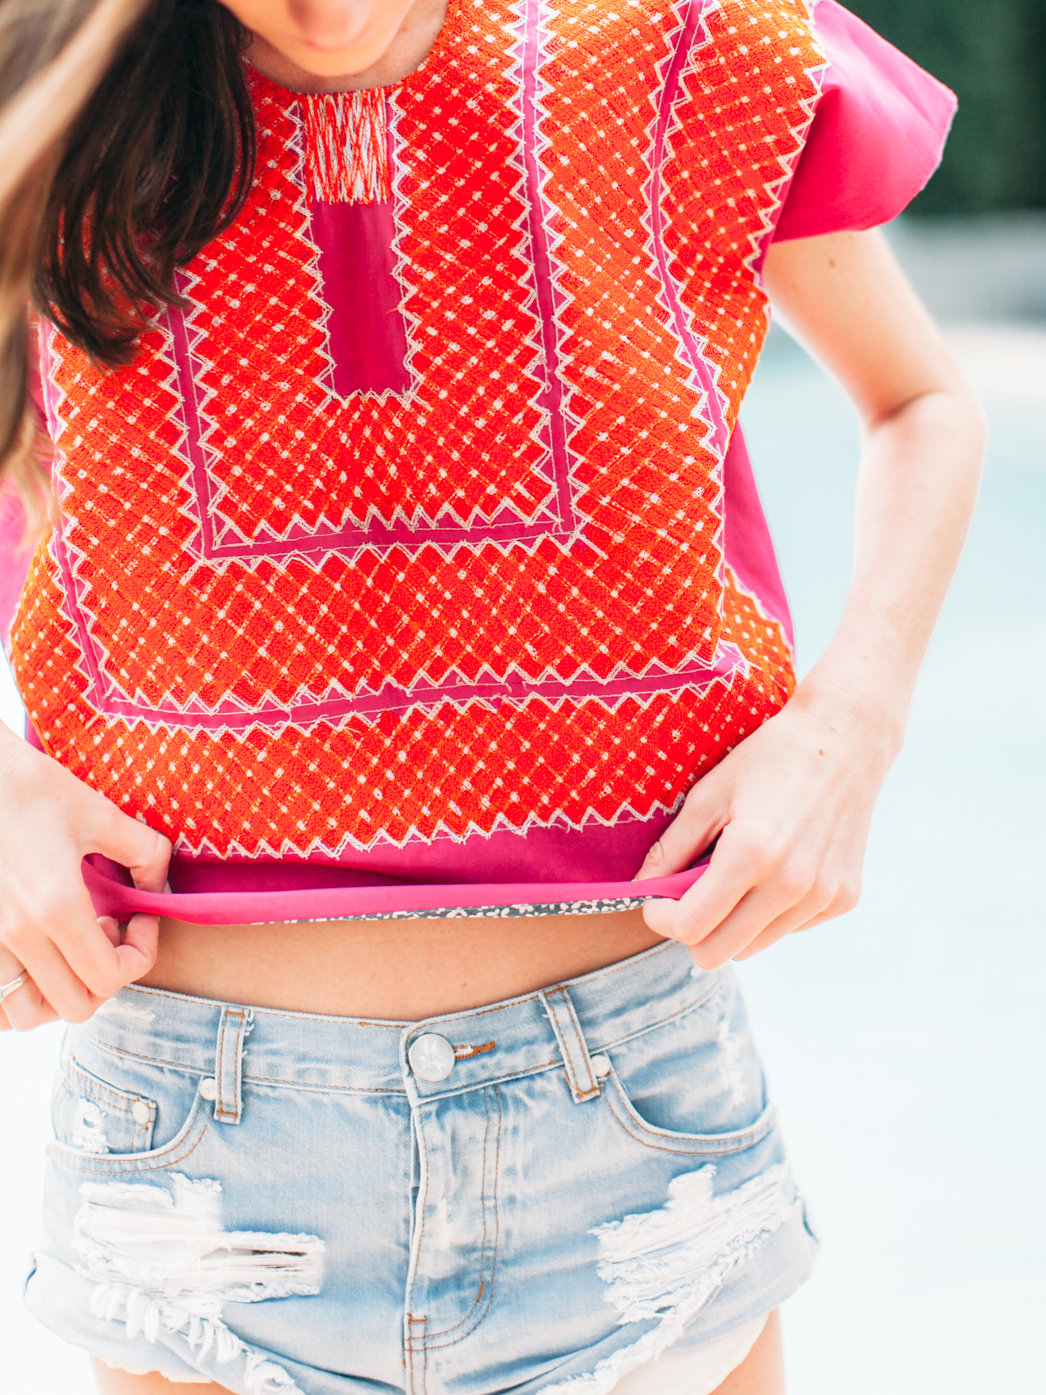 dallas-fashion-blog-being-bridget-7754